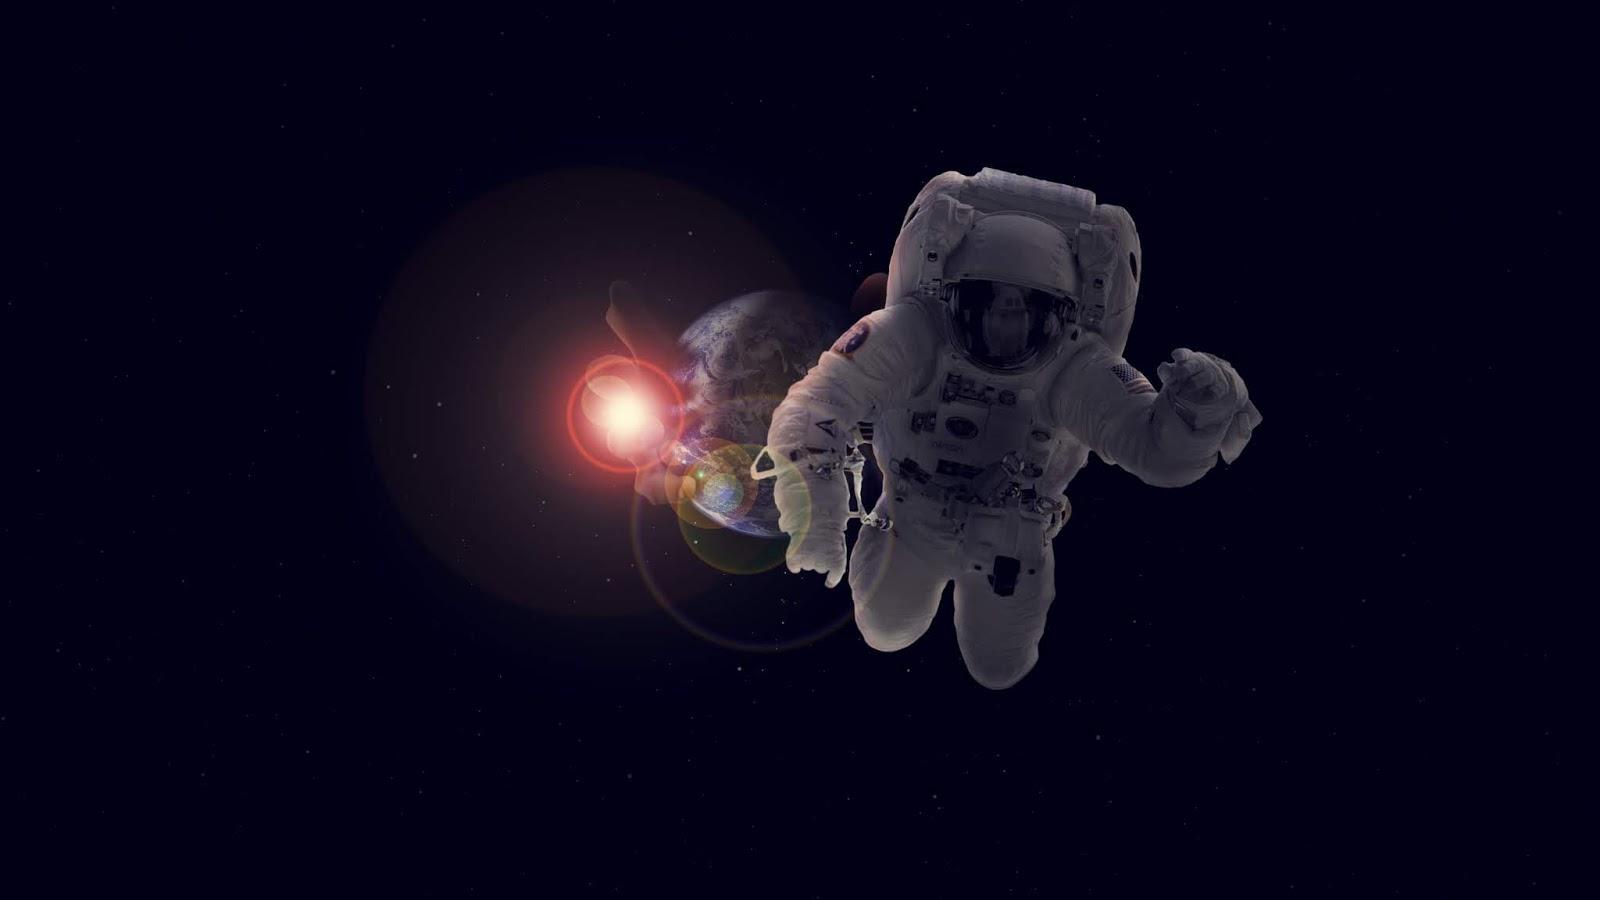 Astronaut, Deep Space, Flare, 4K, Space